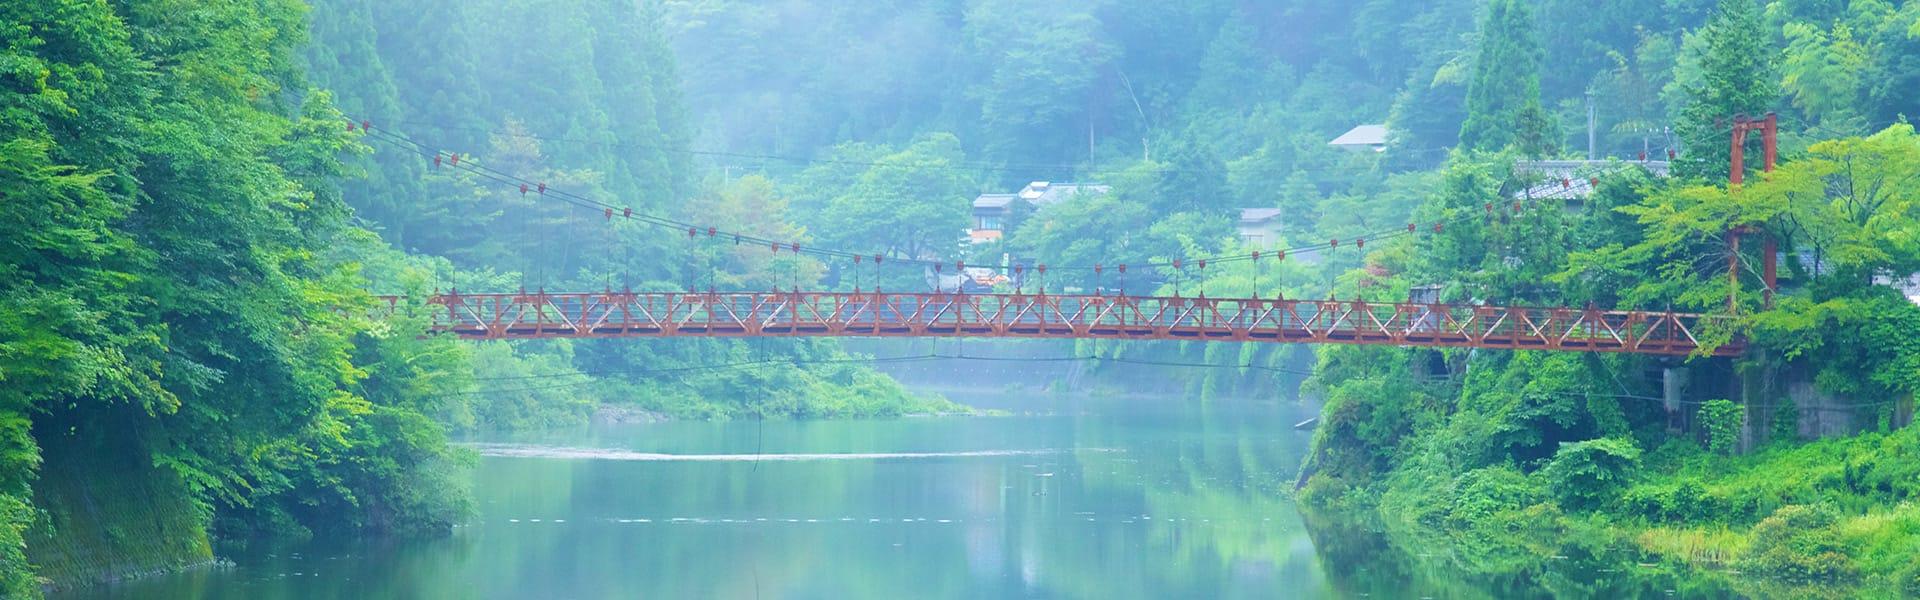 Asia: Taipéi, Osaka, Okinawa y Nagoya a Tokio